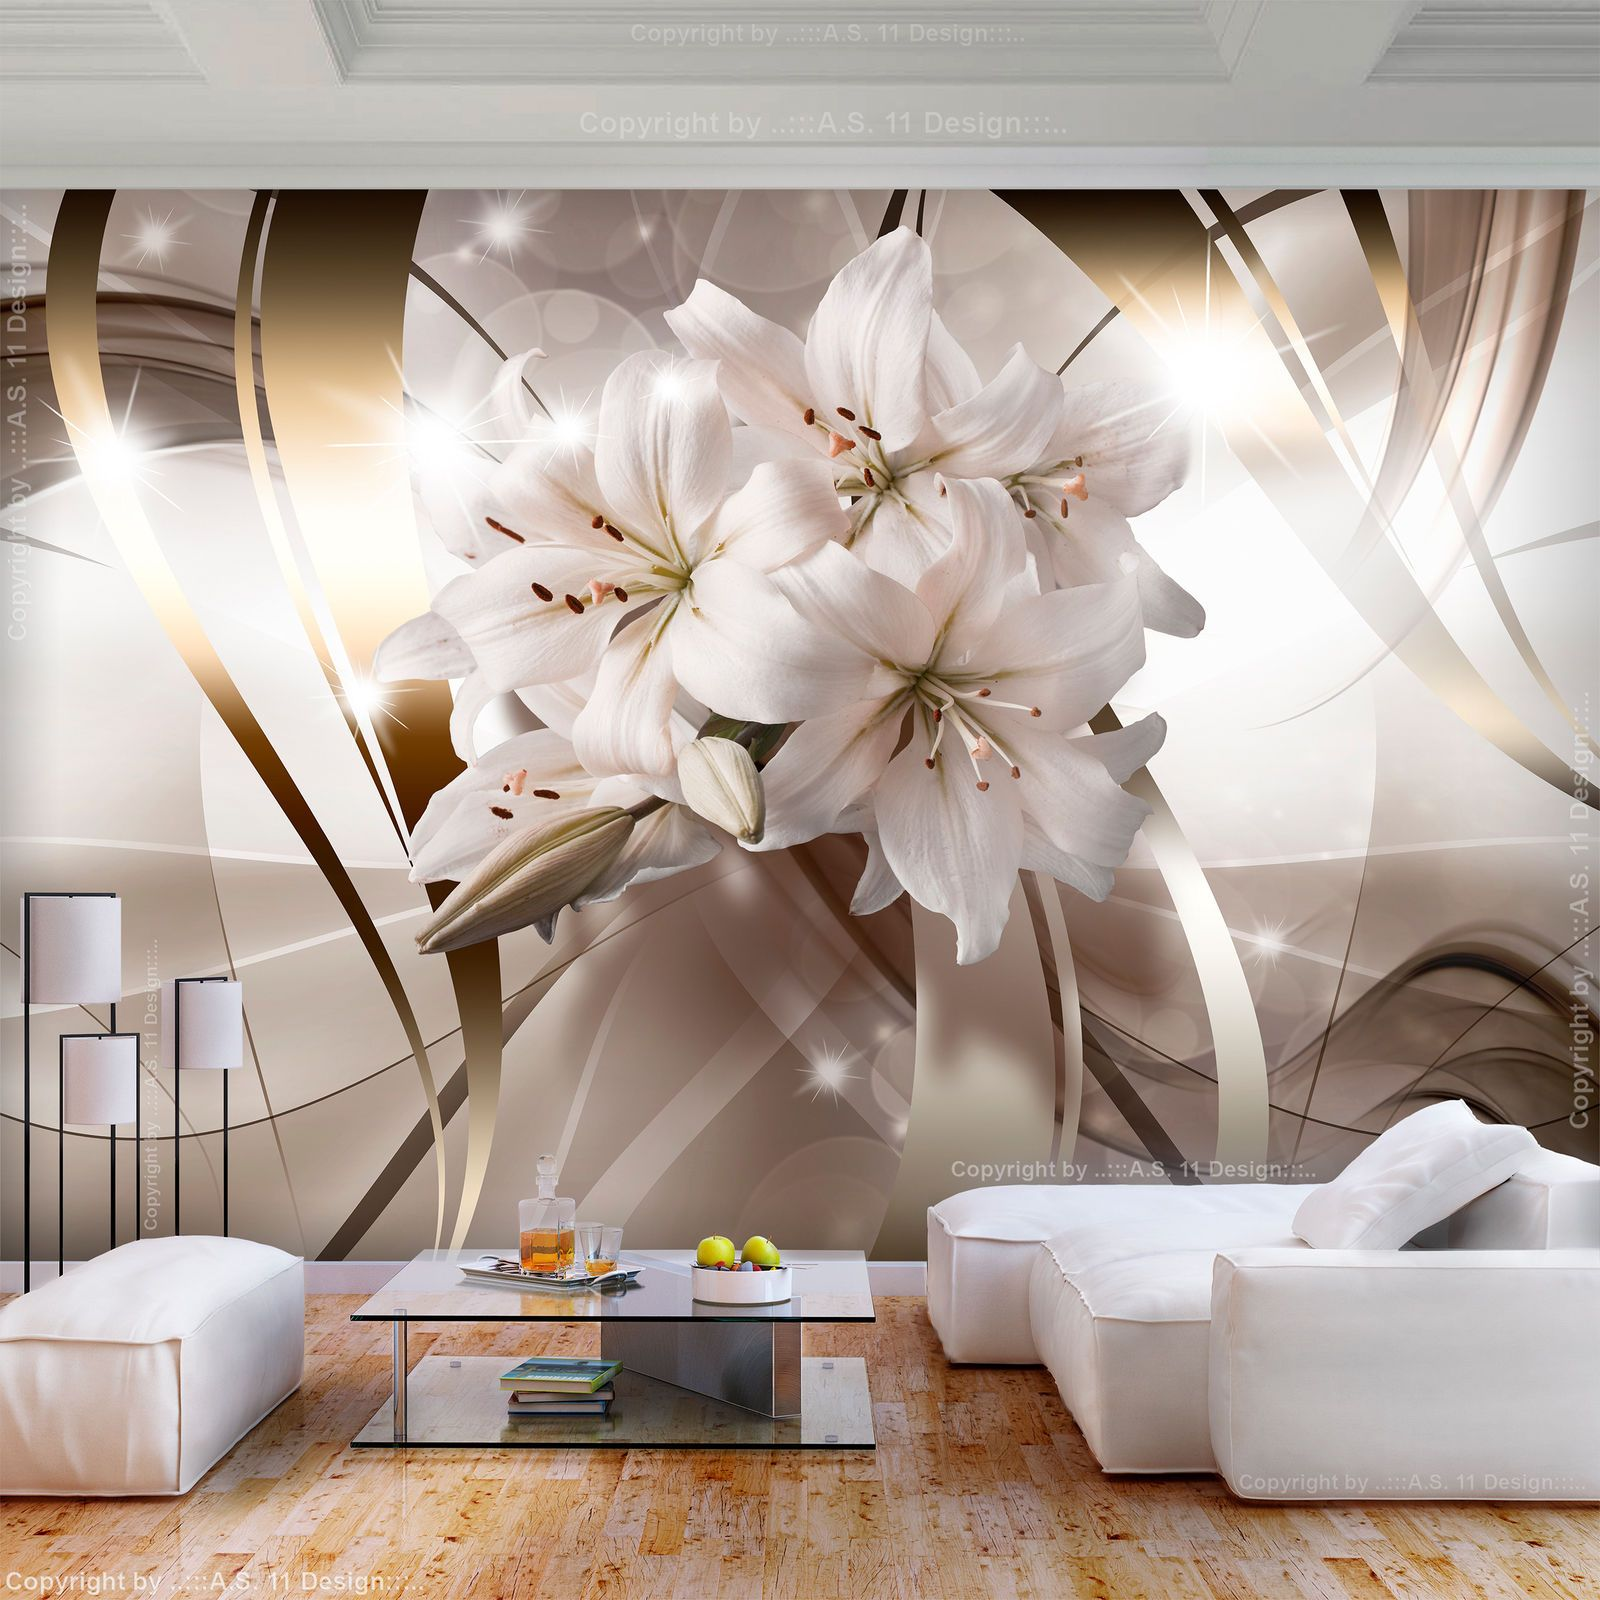 Vlies Fototapete Blumen Lilien 3d Effekt Tapete Wandbilder Xxl